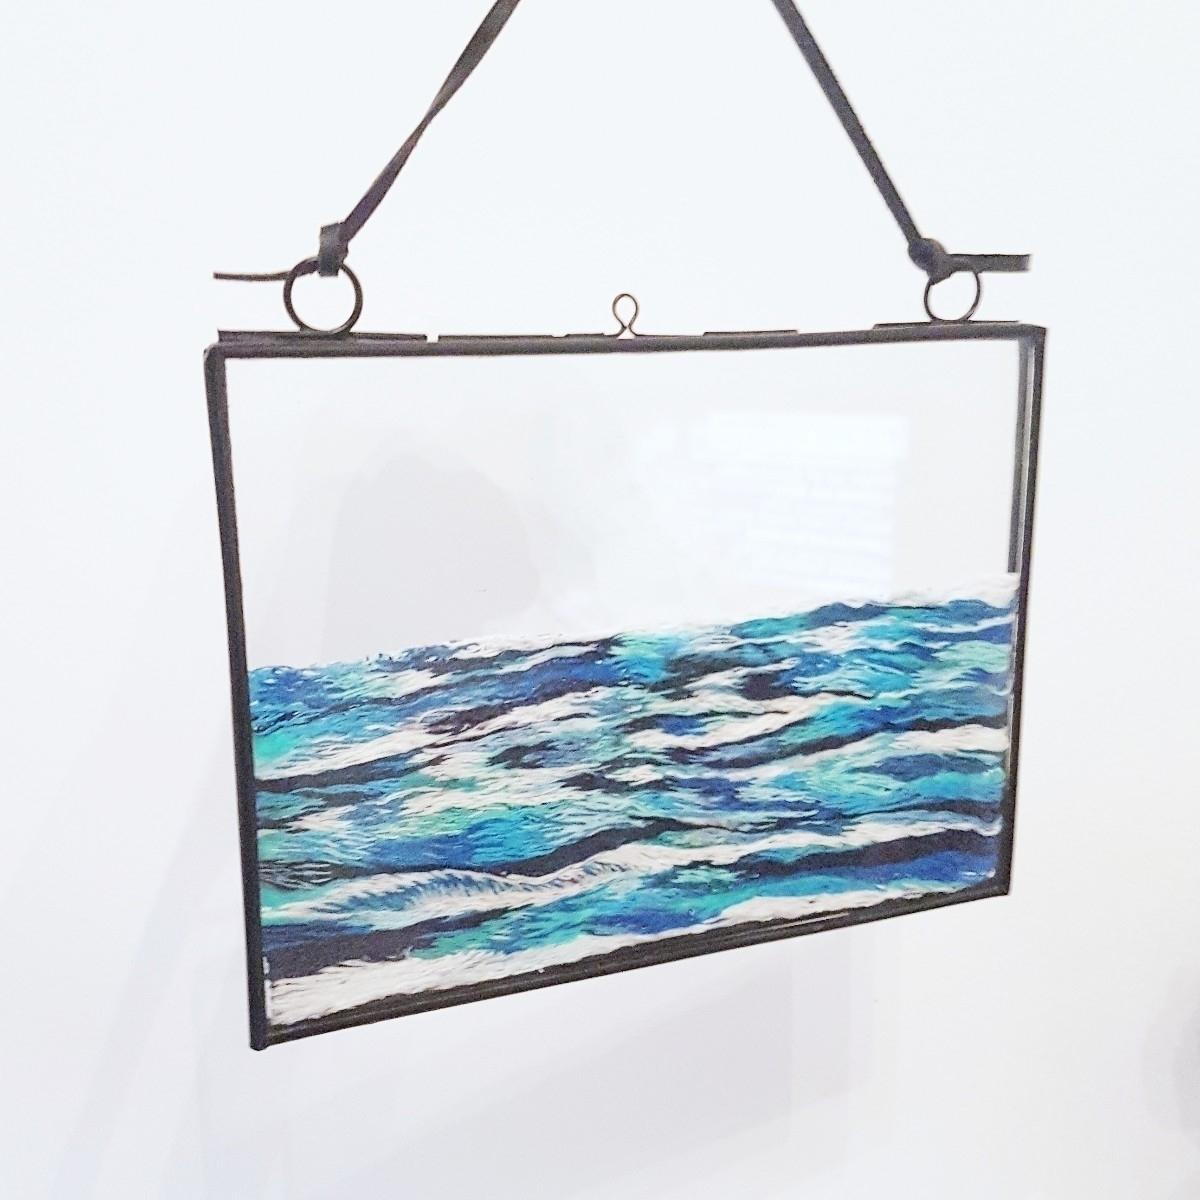 sea embroidery floating frame - textileart - fullmetalneedle | ello